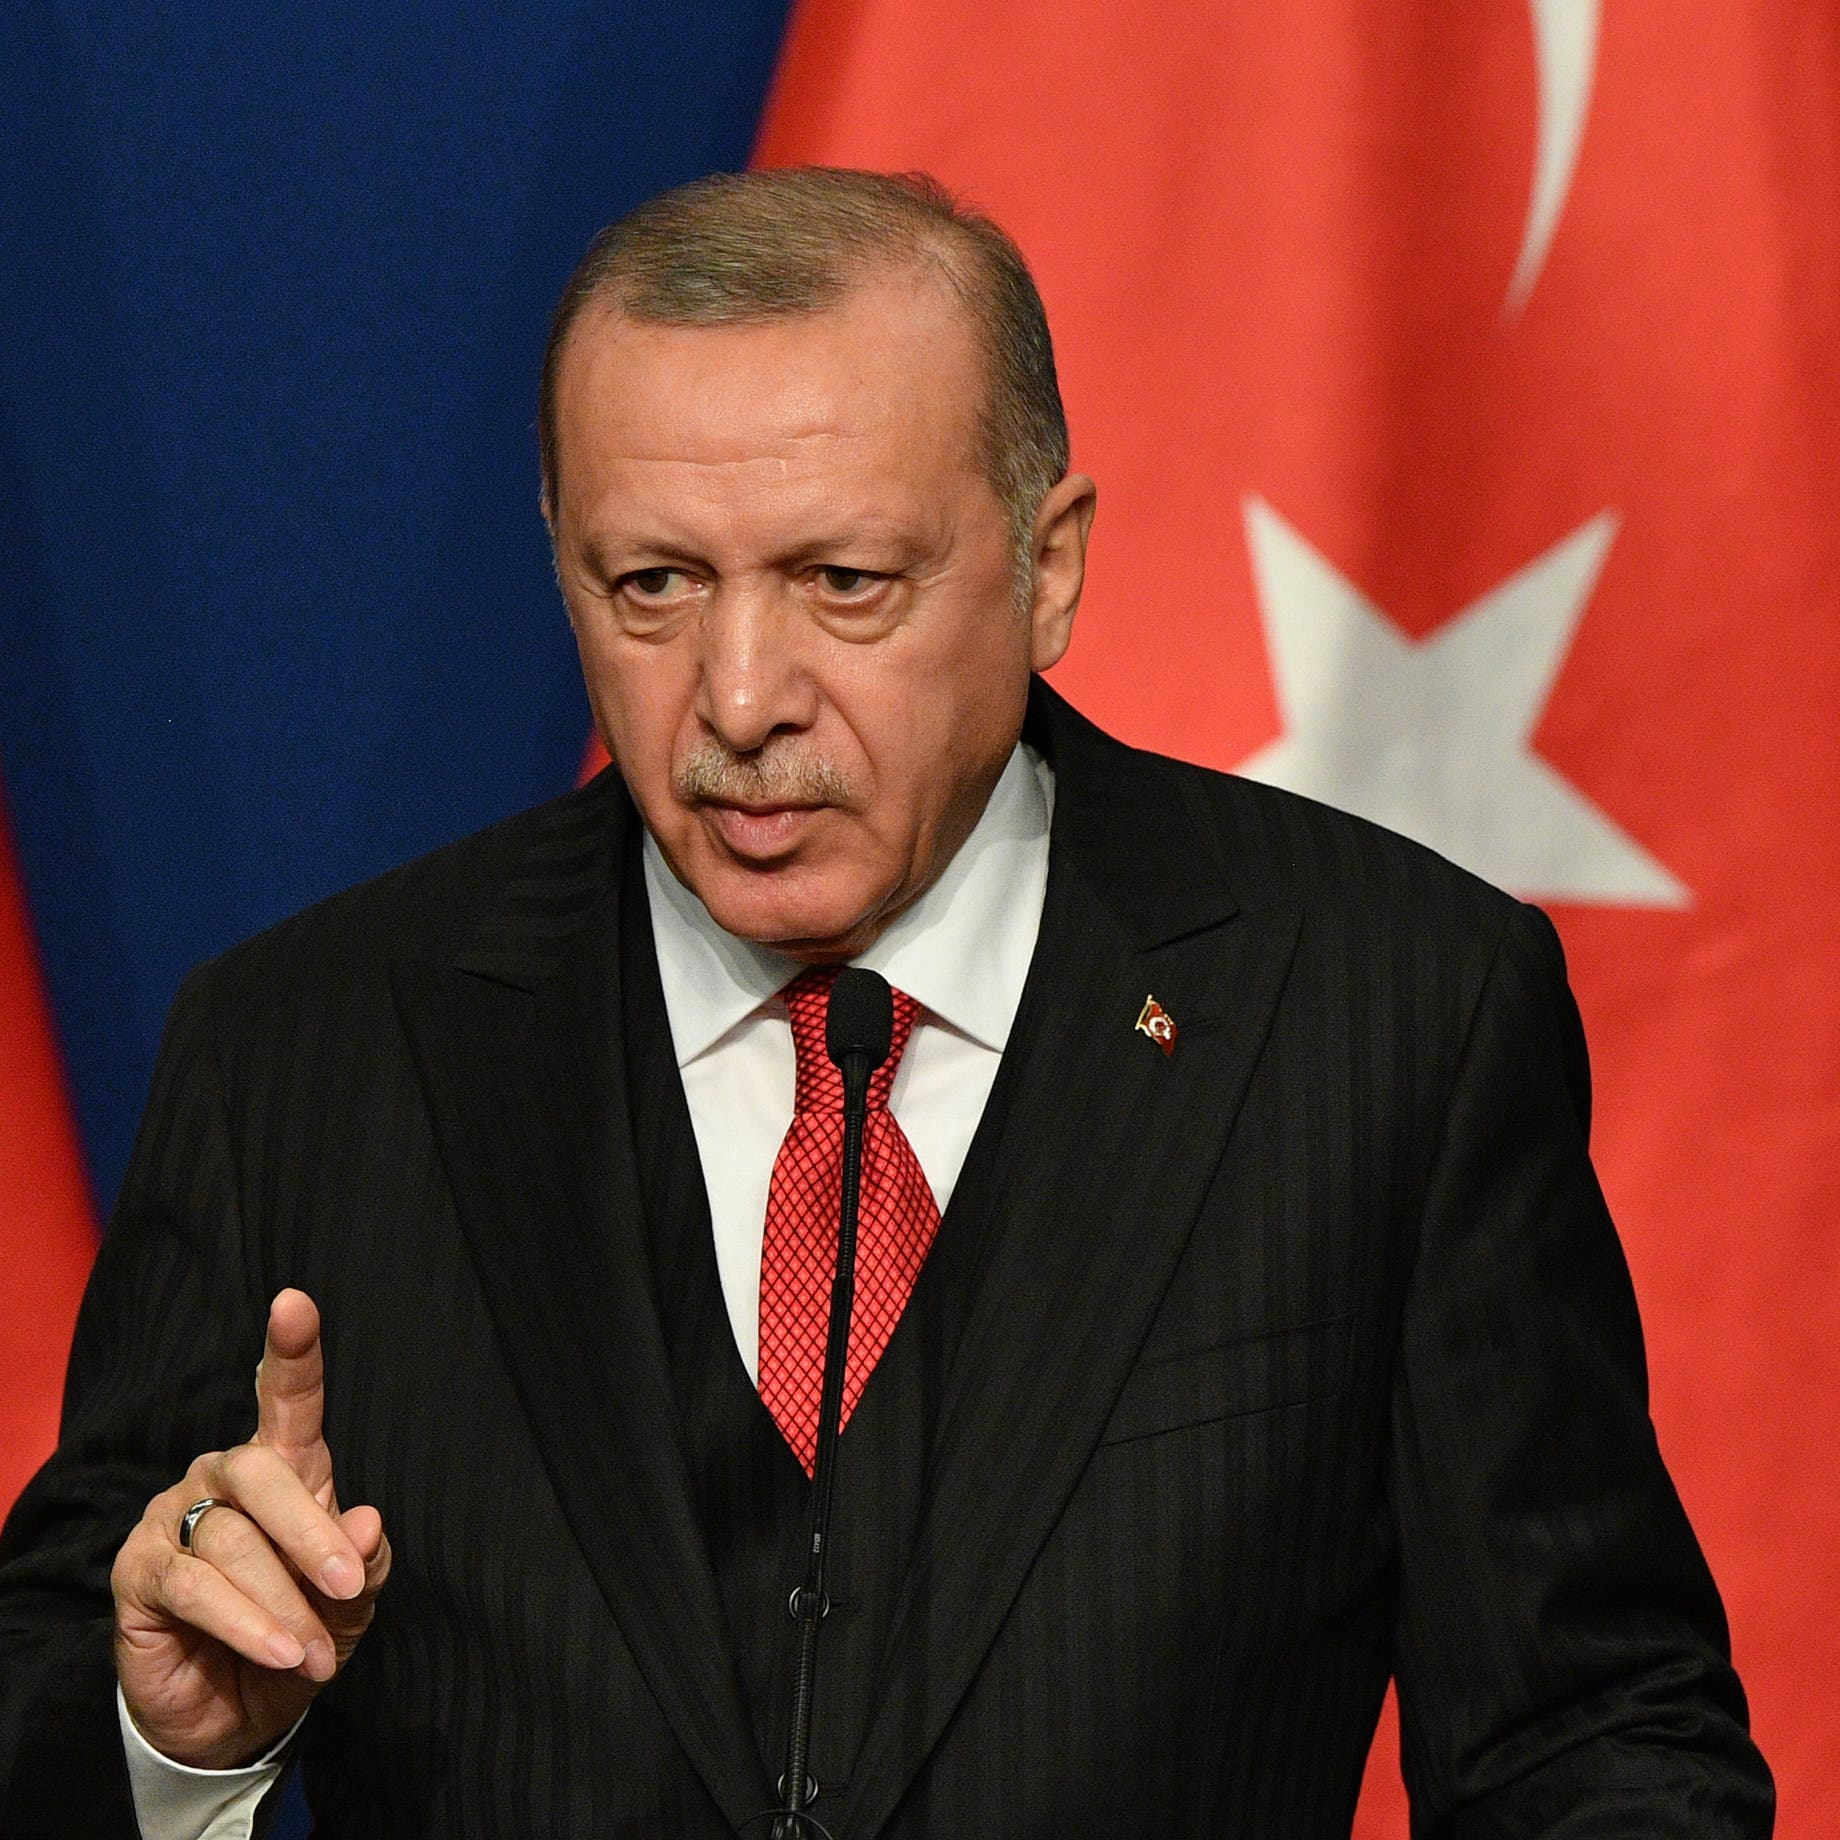 أردوغان: واشنطن لم تلتزم بتعهداتها في سوريا